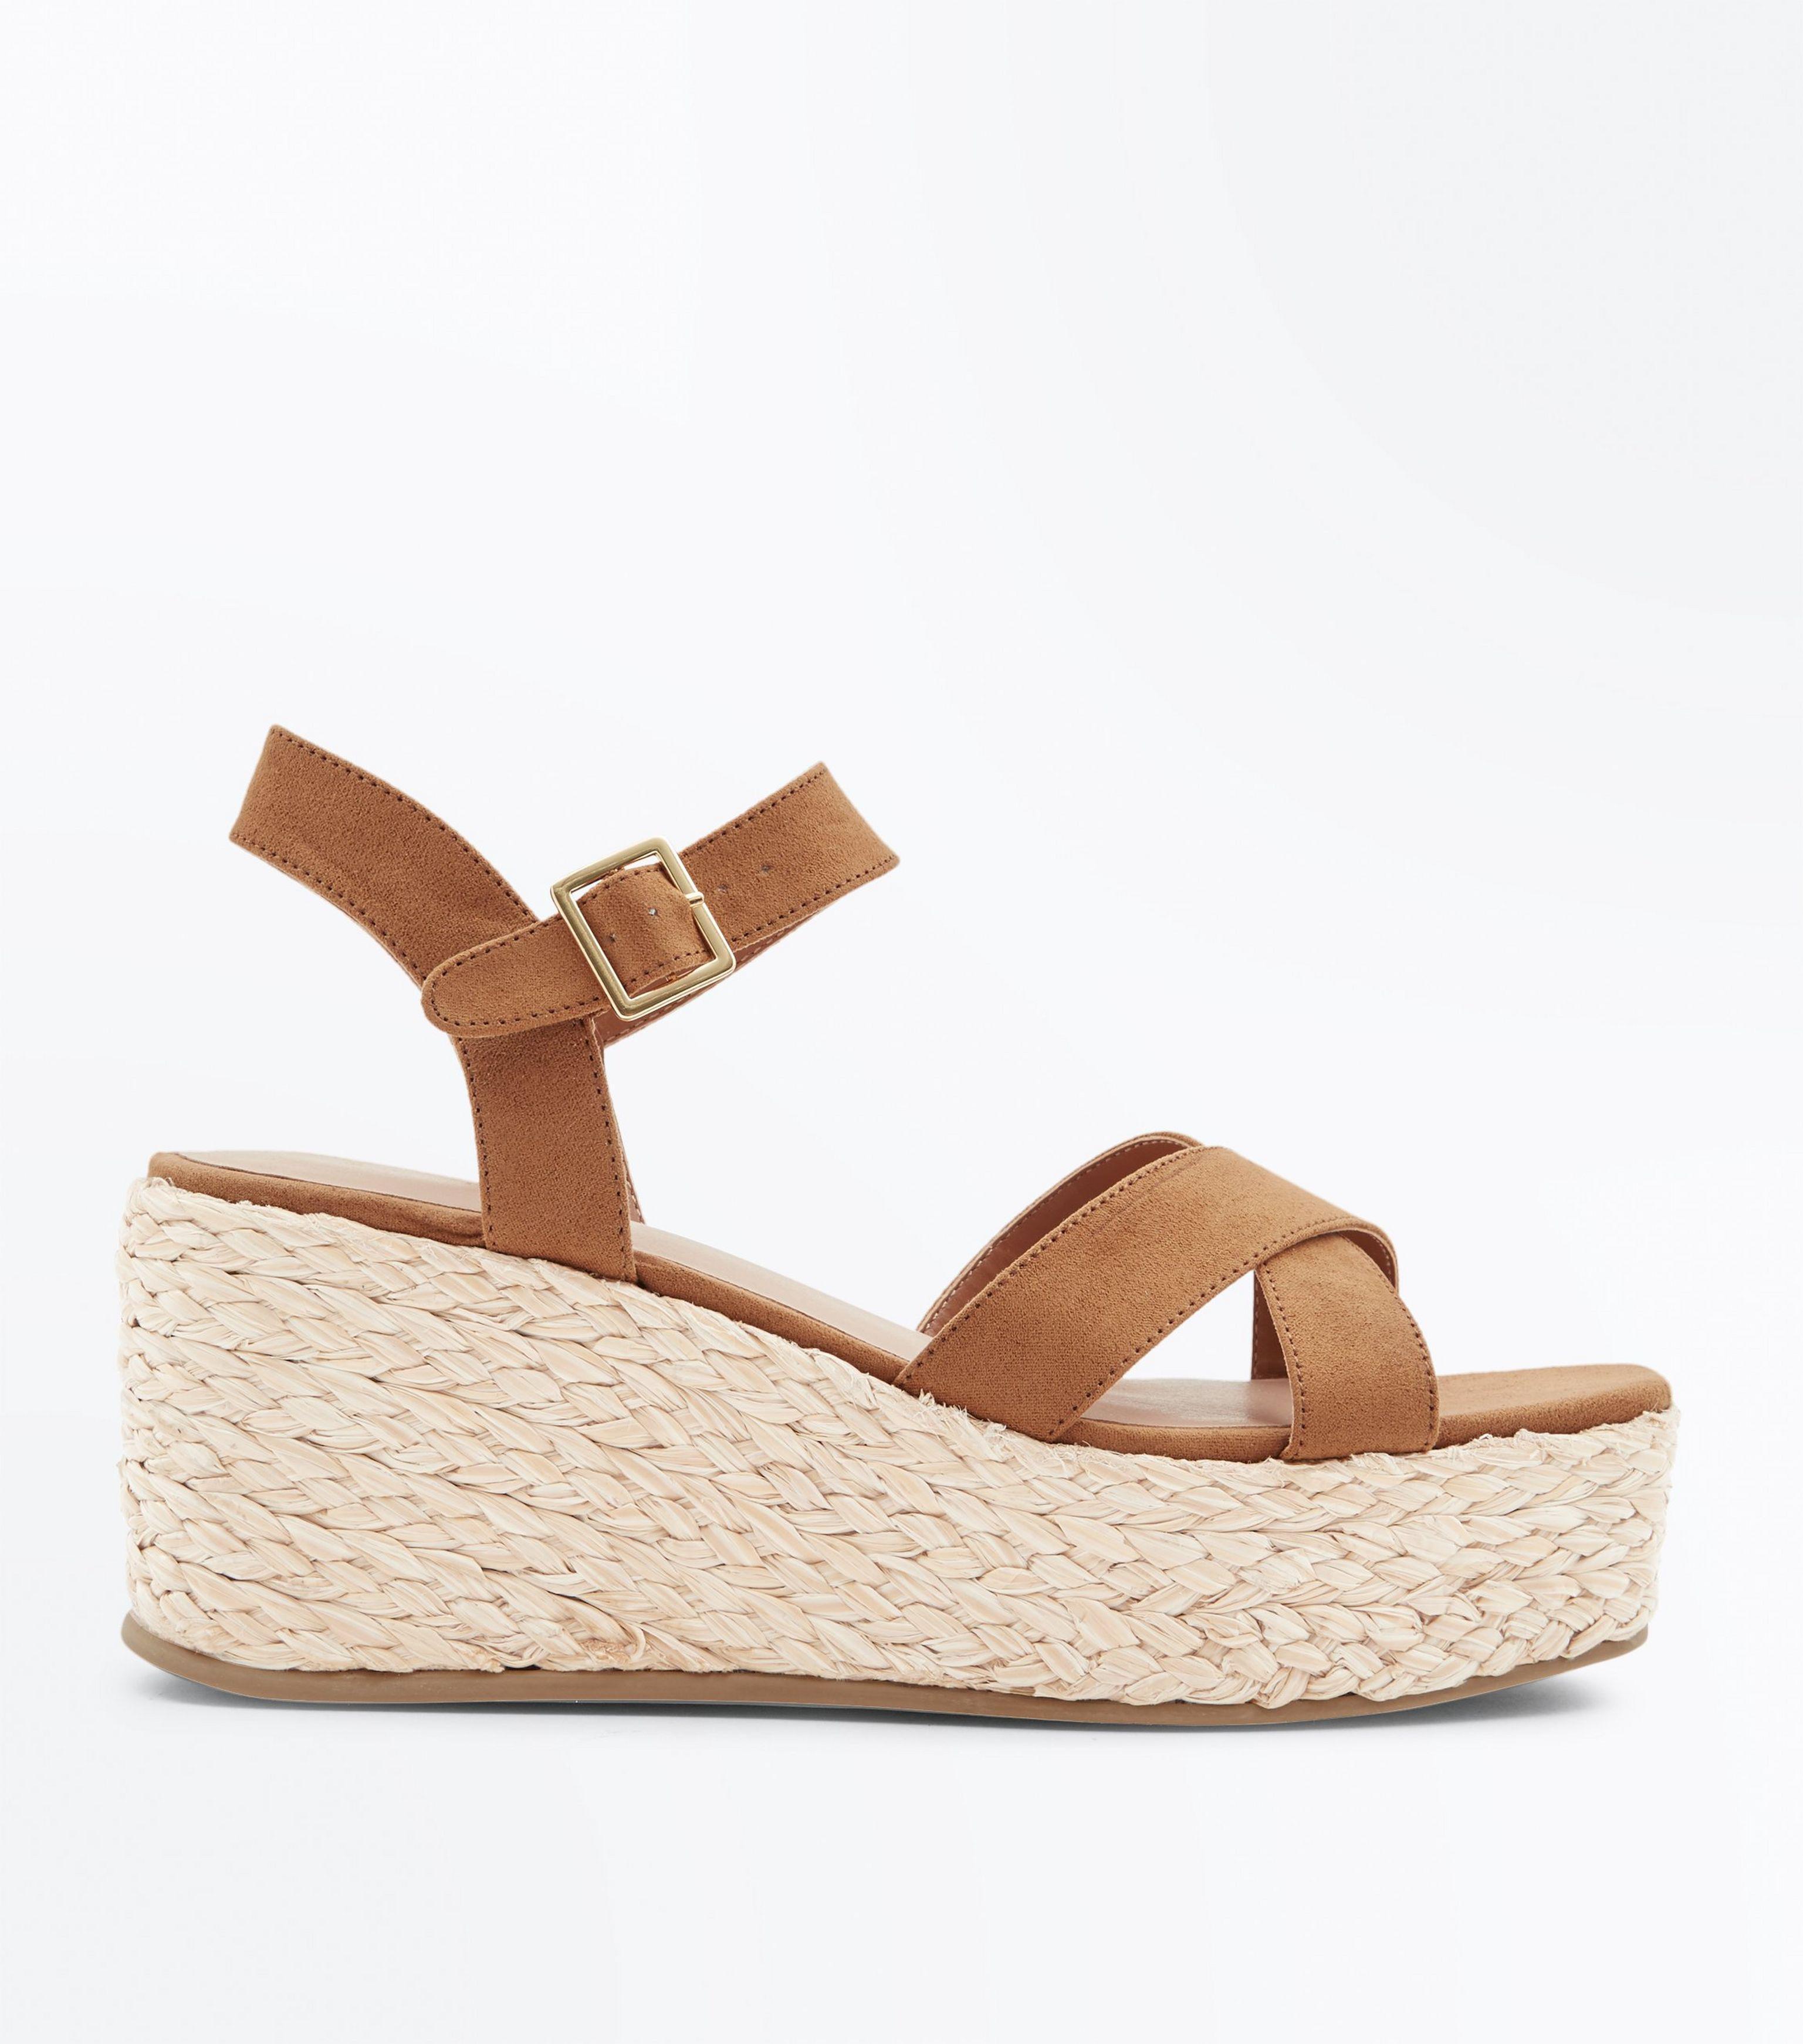 0c339d79bc14 New Look Tan Suedette Flatform Espadrille Sandals in Brown - Lyst